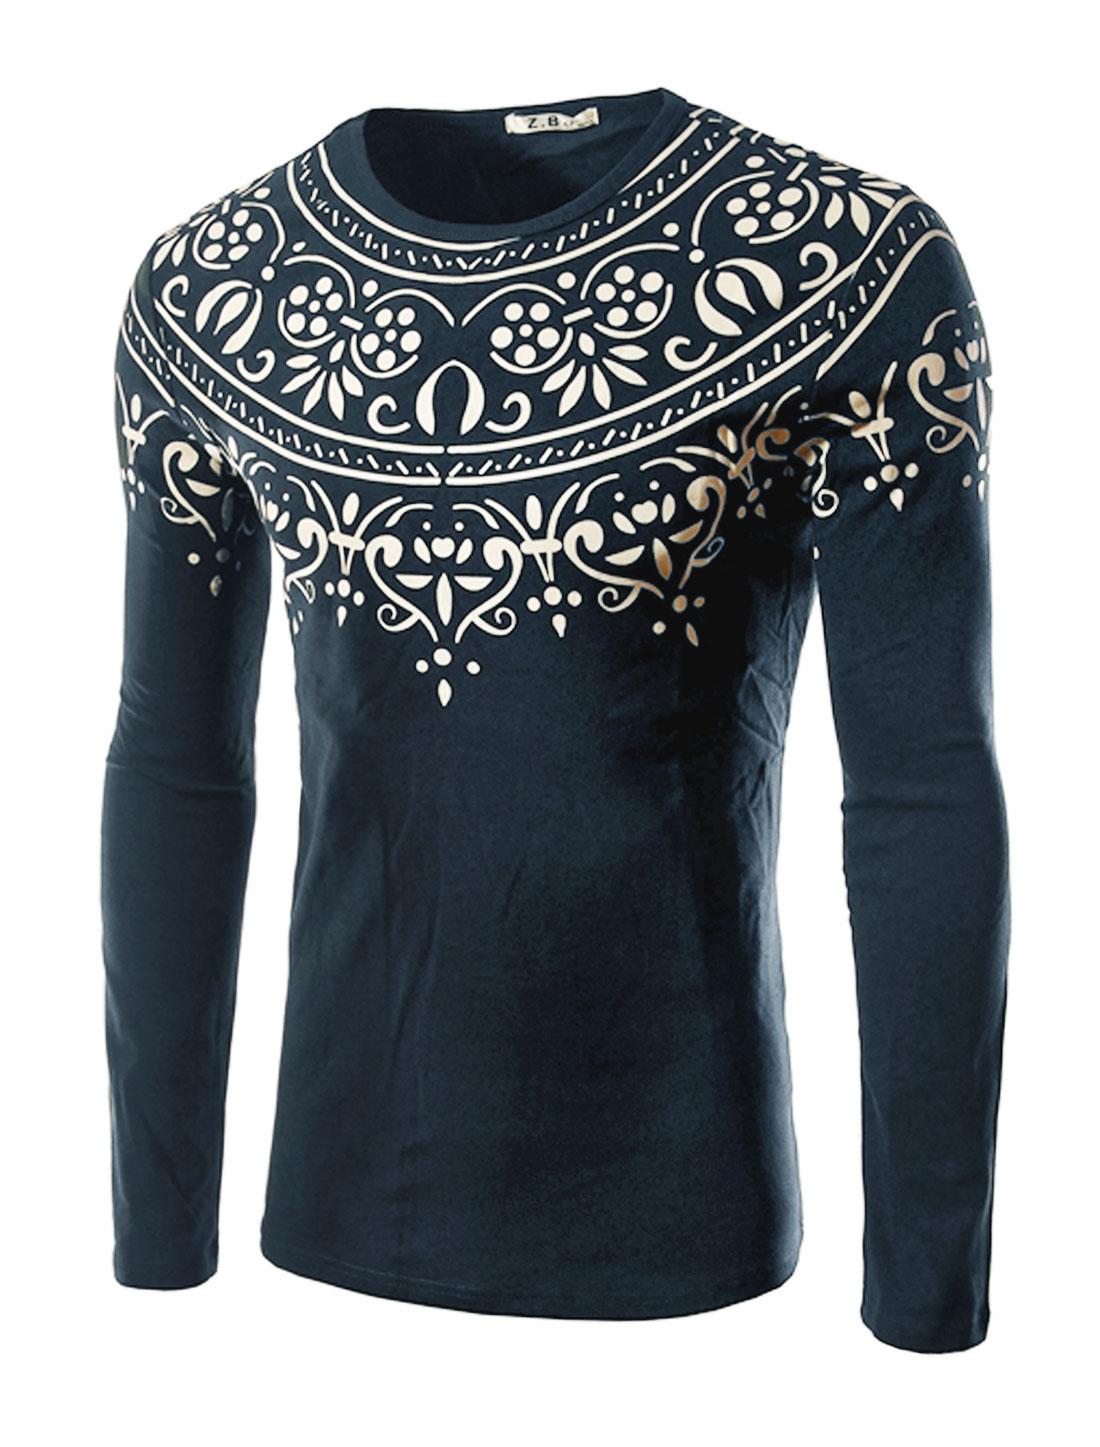 Men Long Sleeves Slim Fit Novelty Tee Shirt Blue M